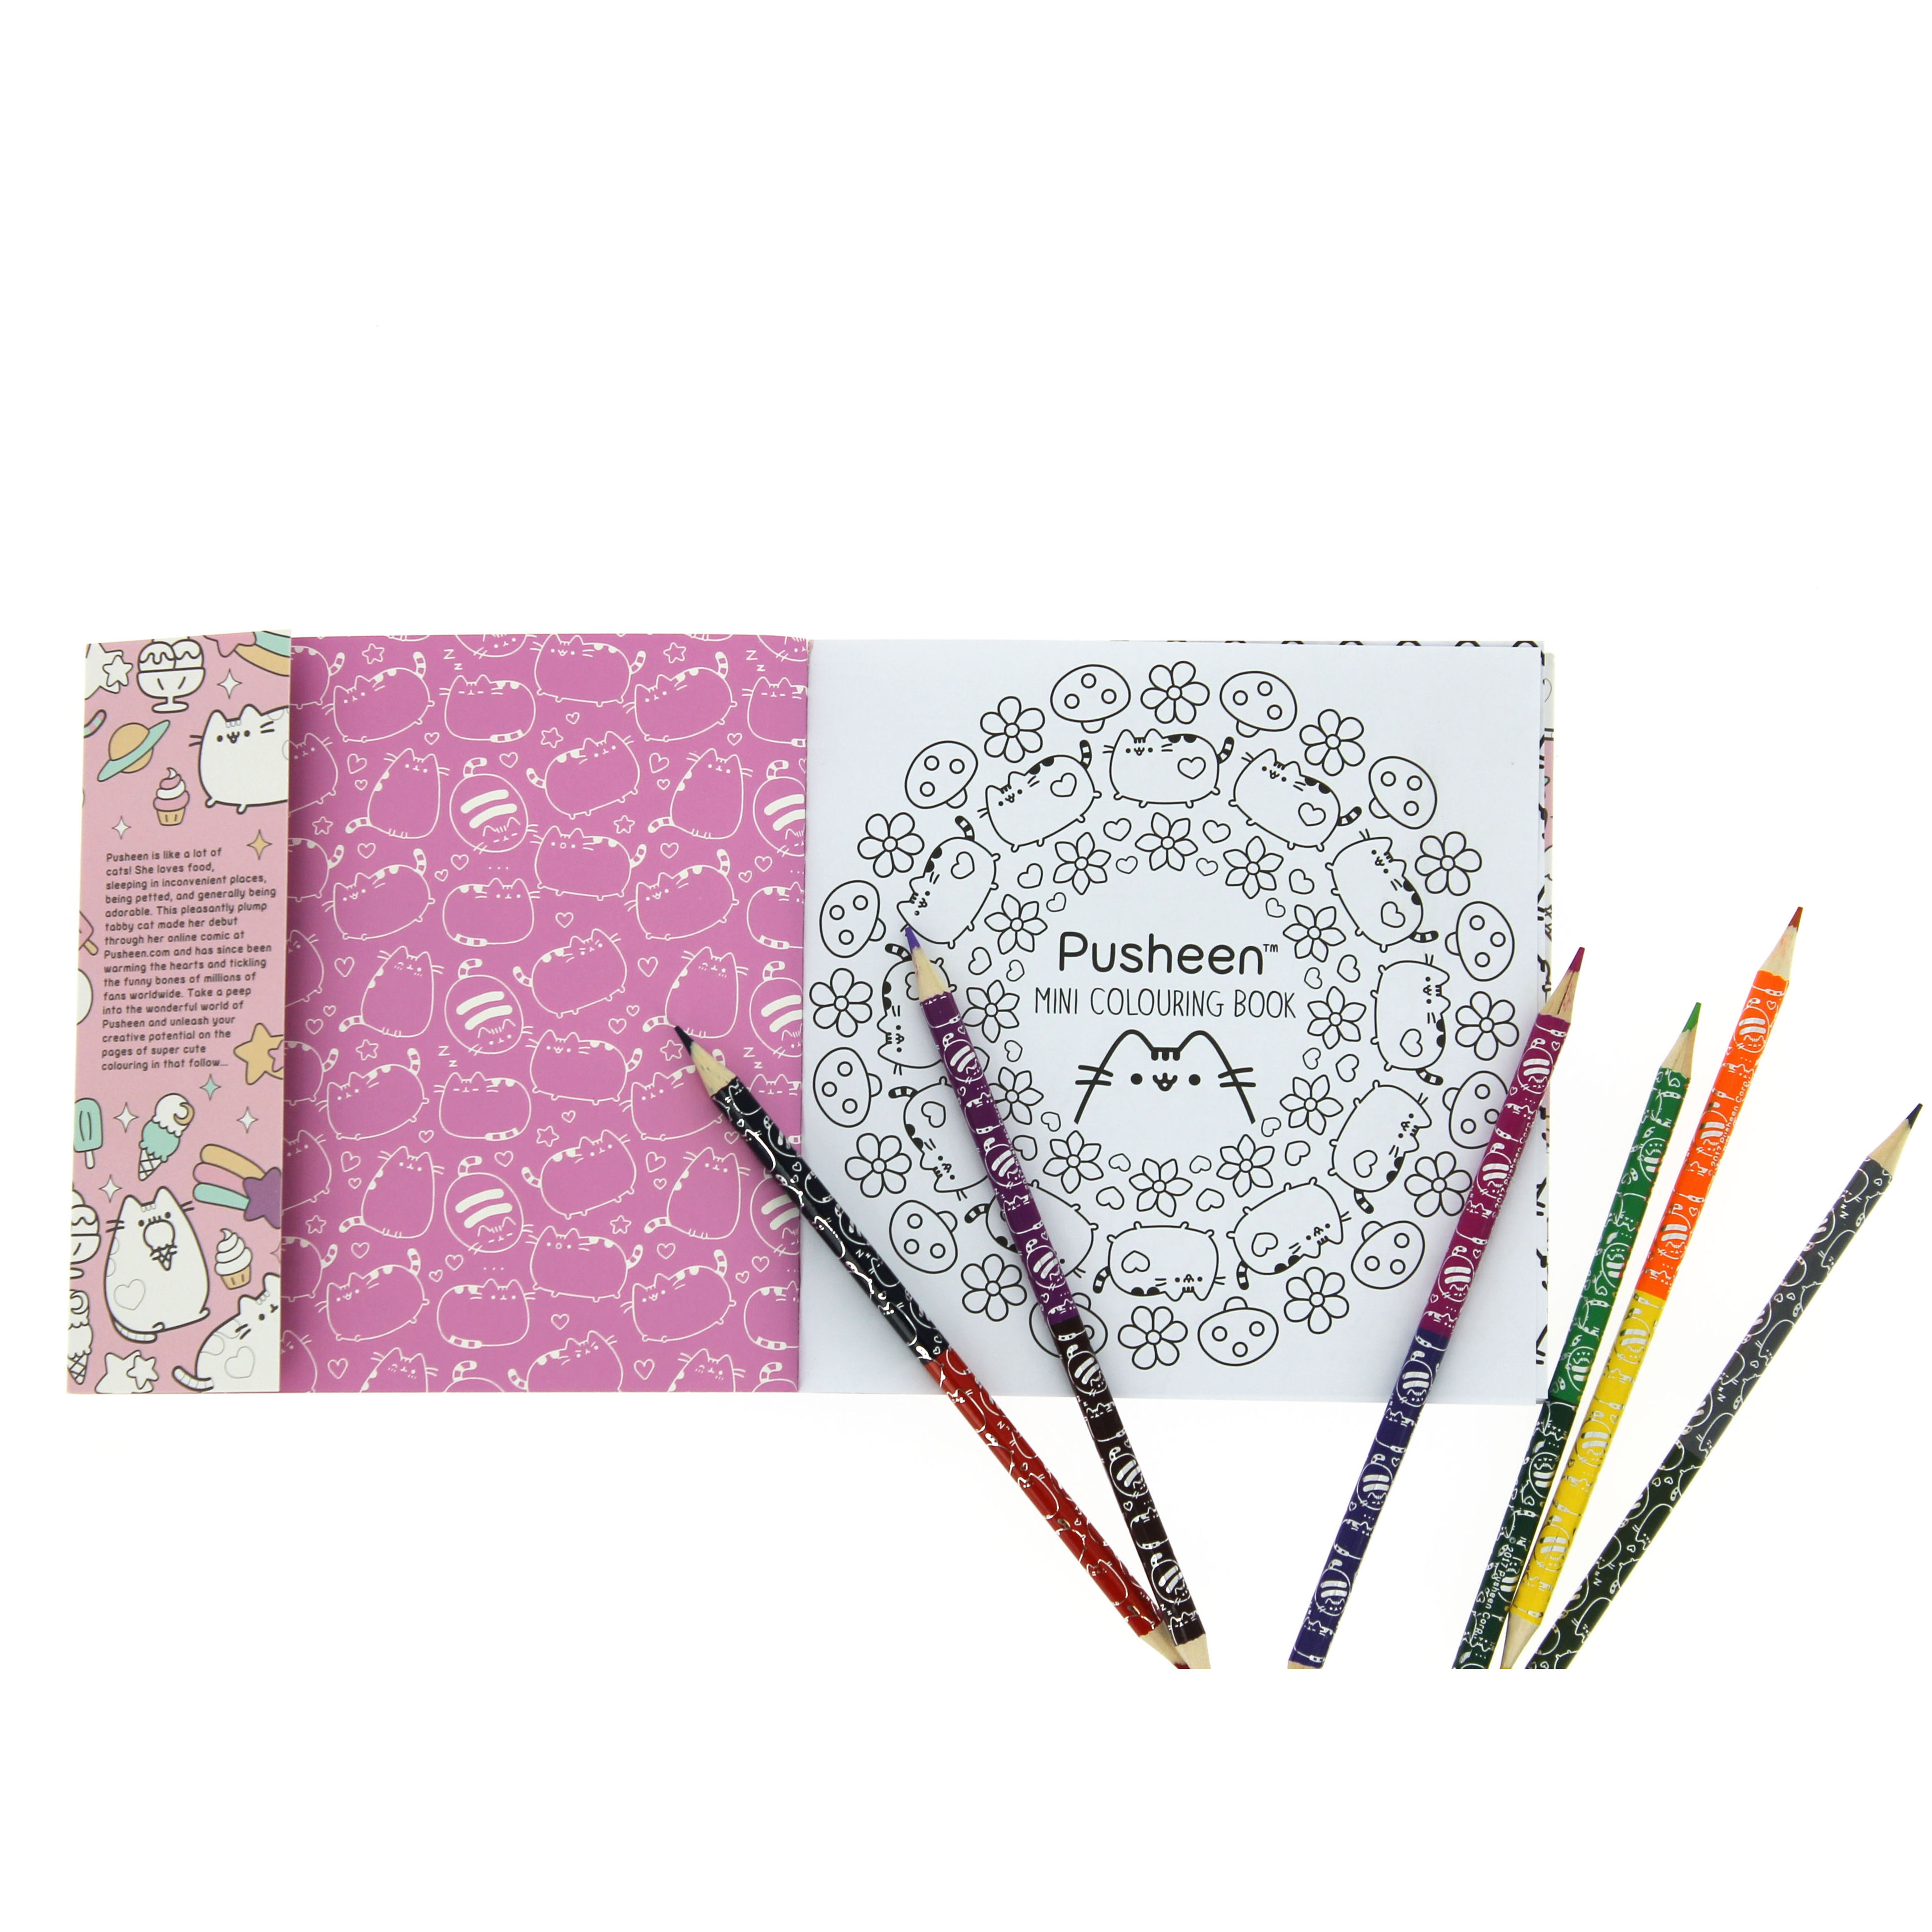 Pusheen Colouring Book Travel Set | Pens & Pencils | KitschaGoGo